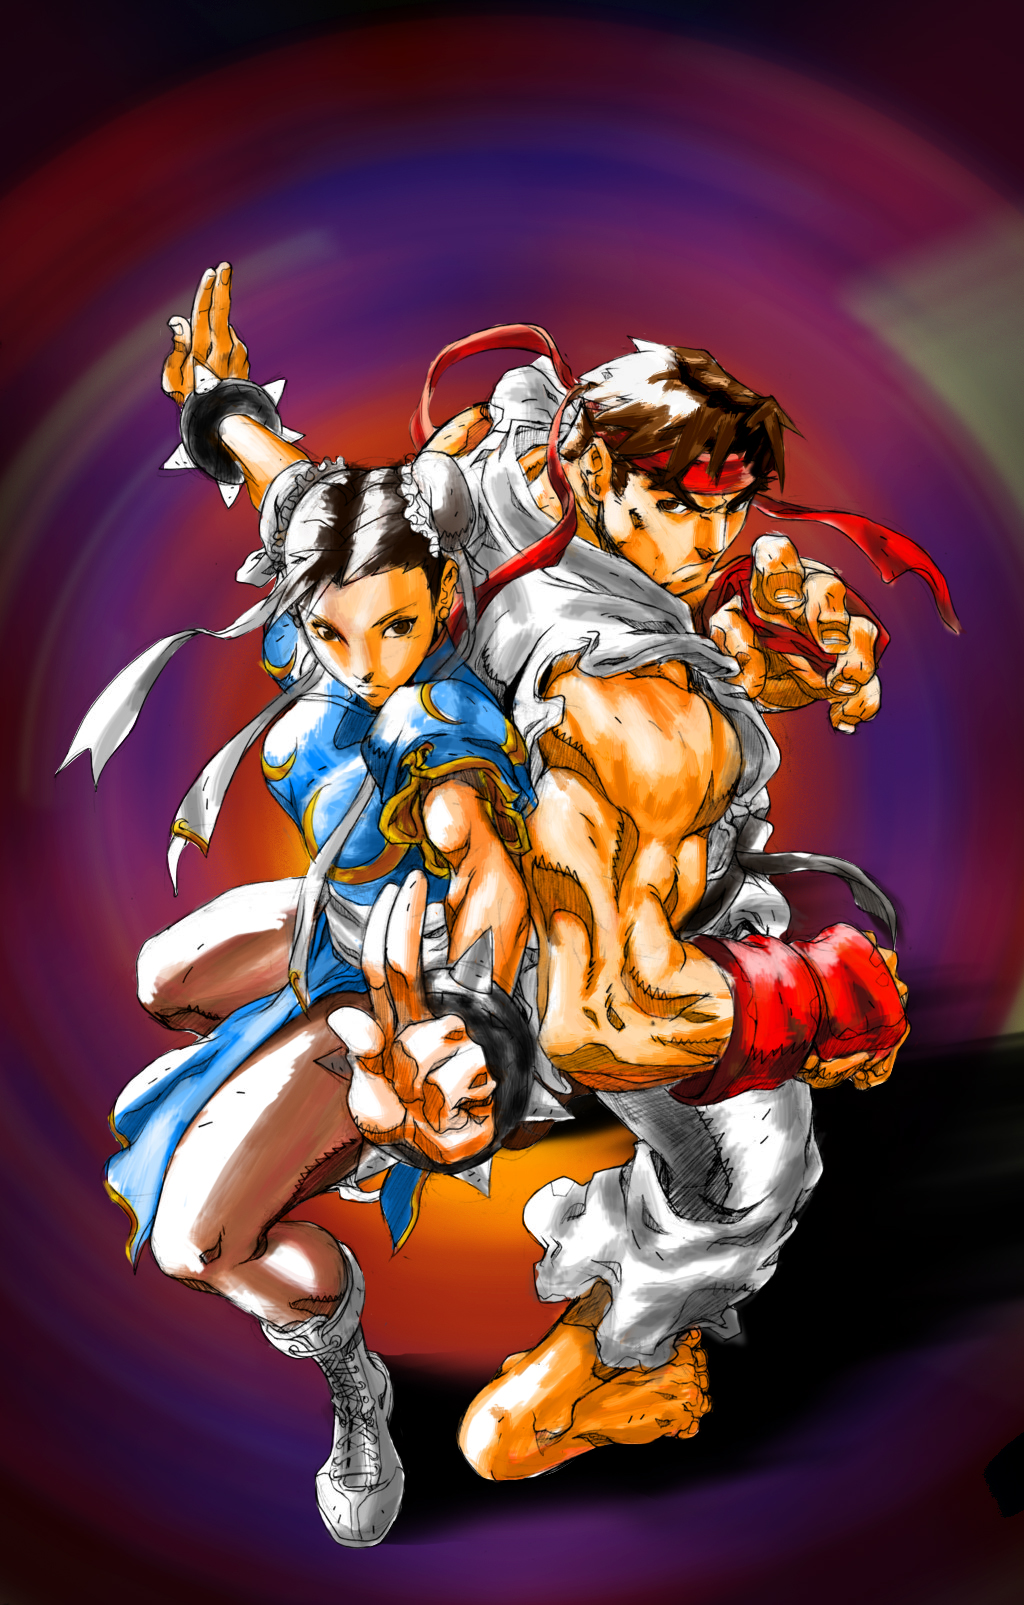 SFII - Ryu and Chun Li Final by KenshinGumi559